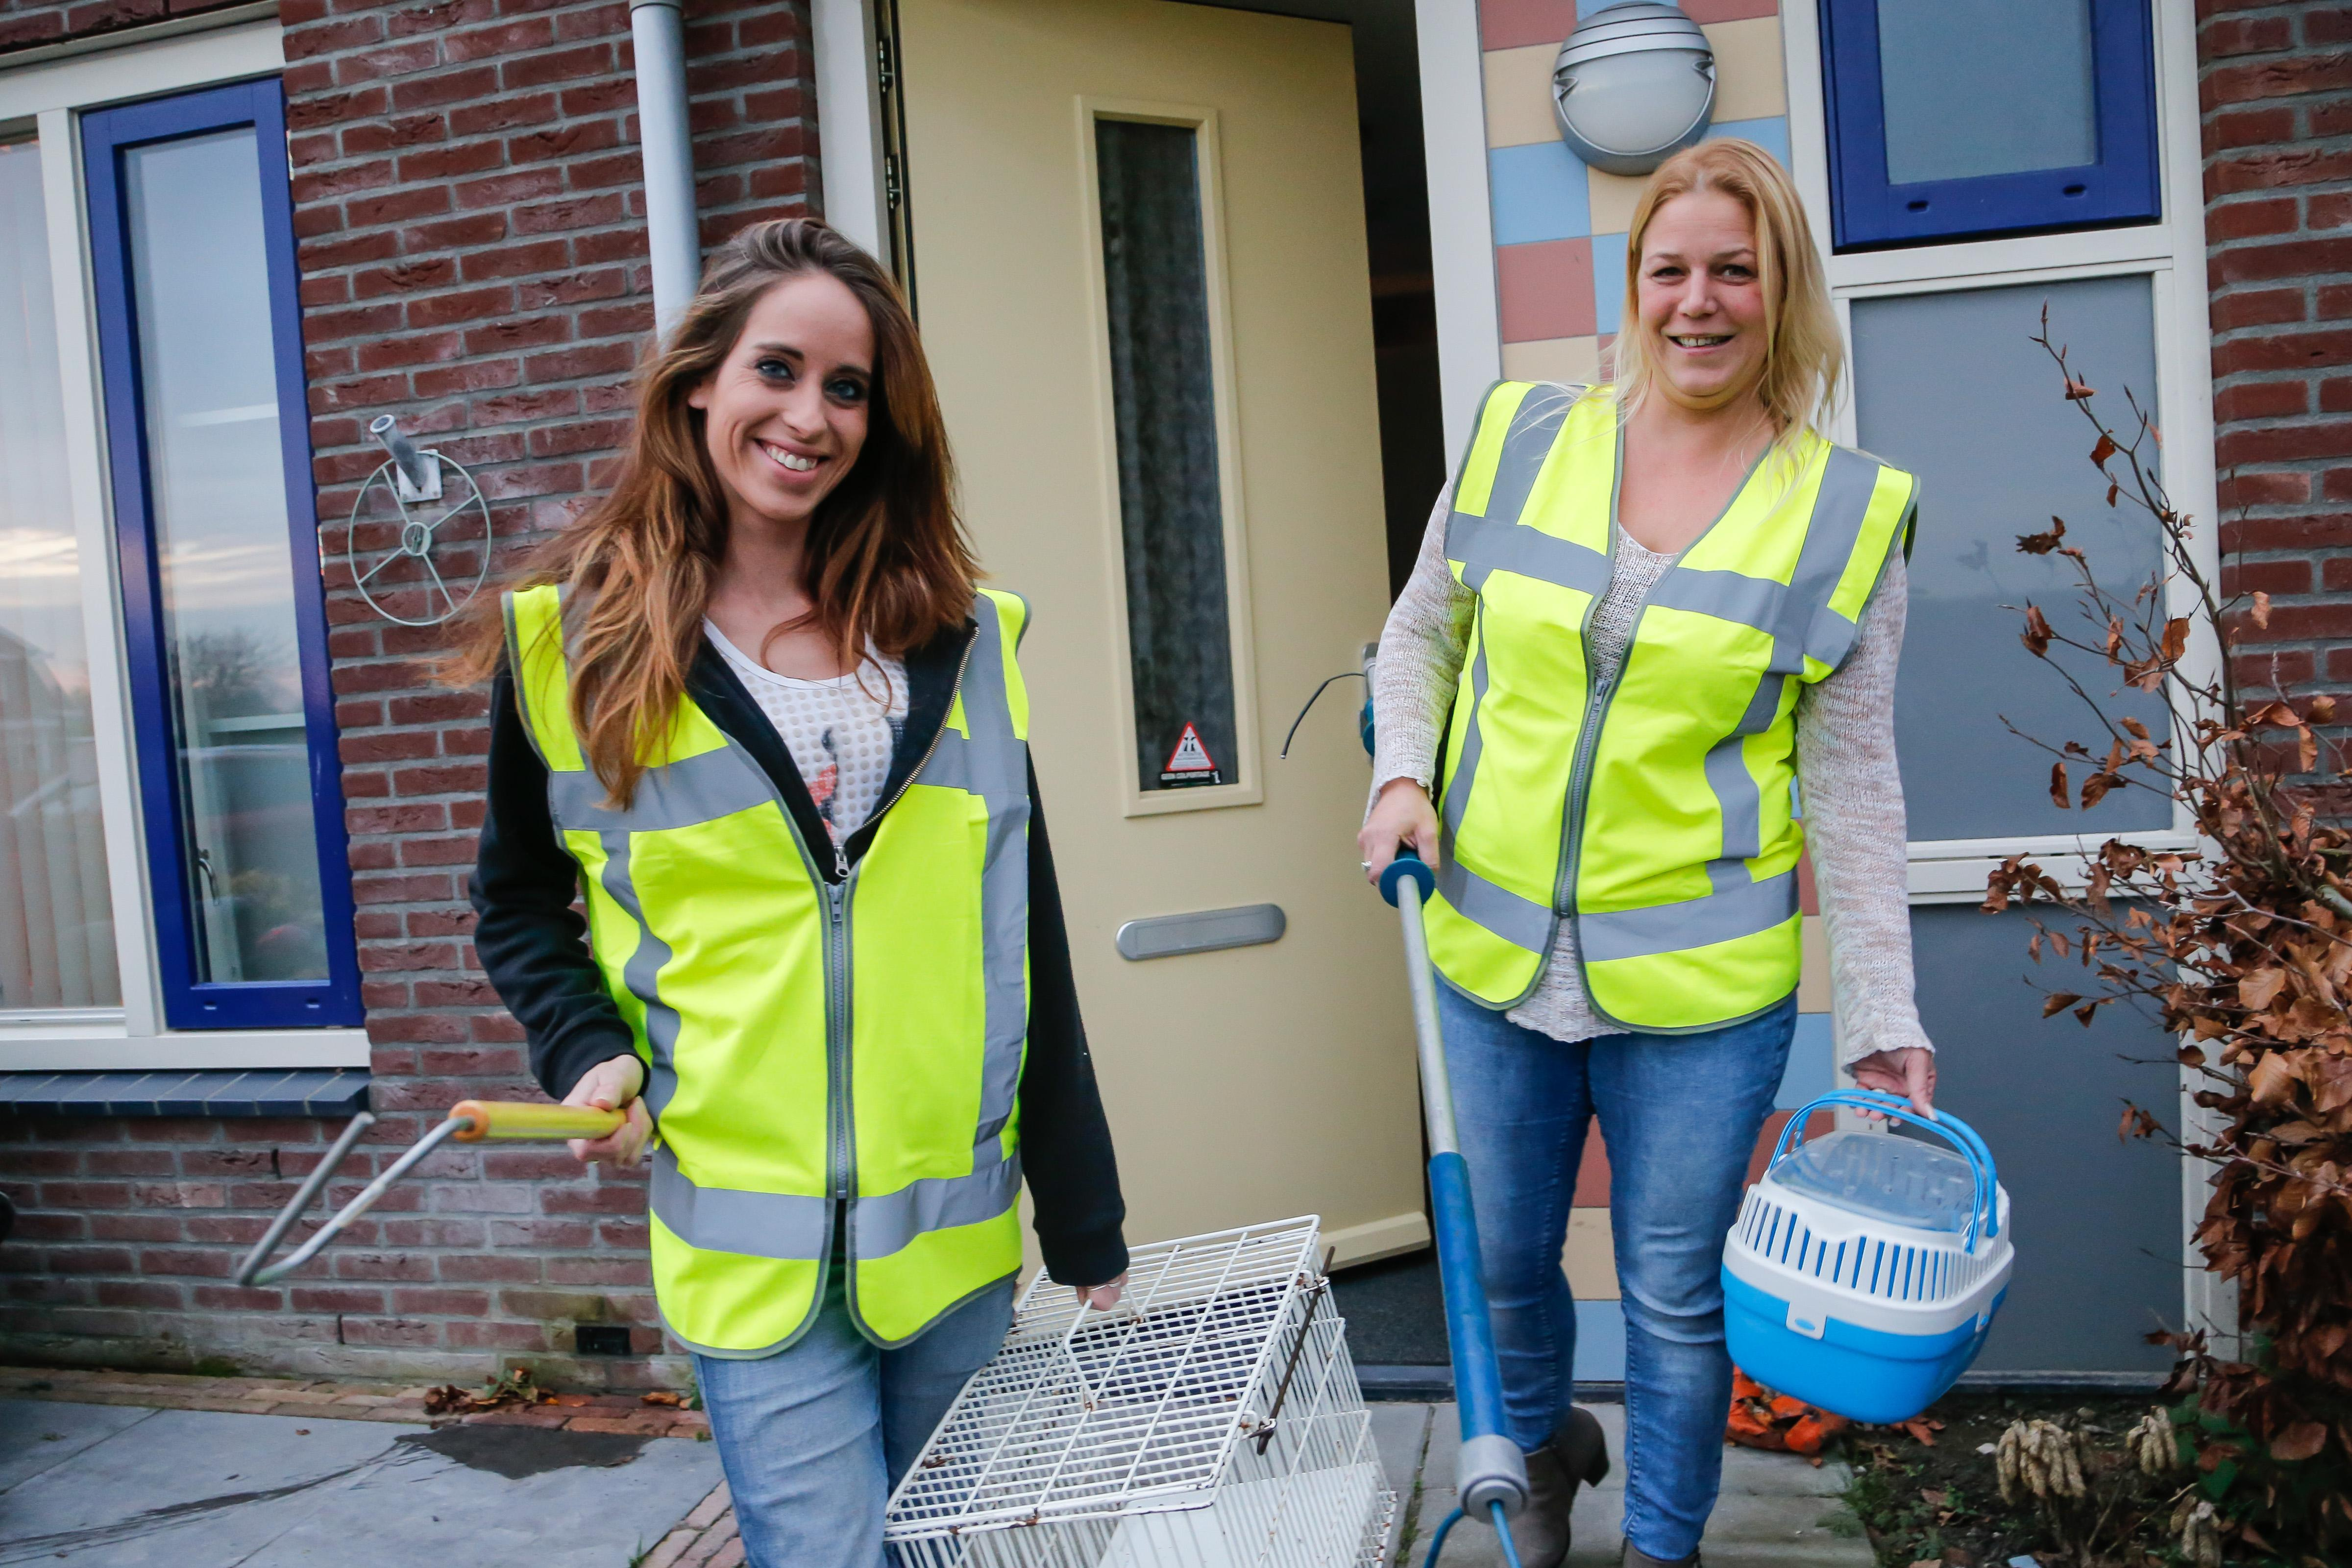 Asiel Hoorn weigert katten tweede dierenambulance